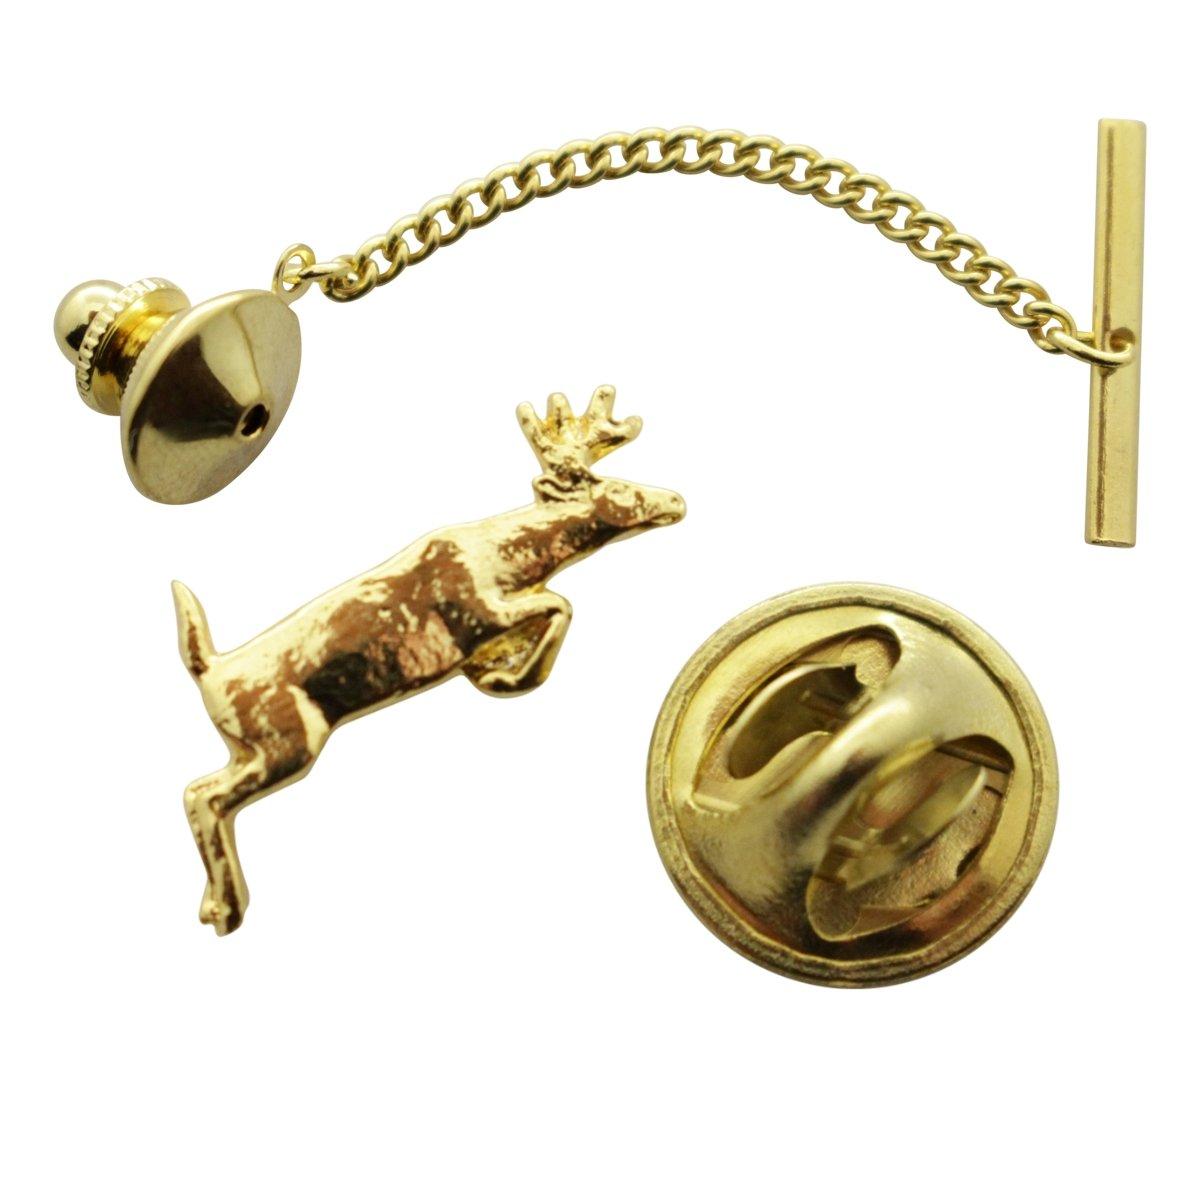 Leaping Deer Tie Tack ~ 24K Gold ~ Tie Tack or Pin ~ Sarah's Treats & Treasures G.G. Harris STT-M420-G-TT